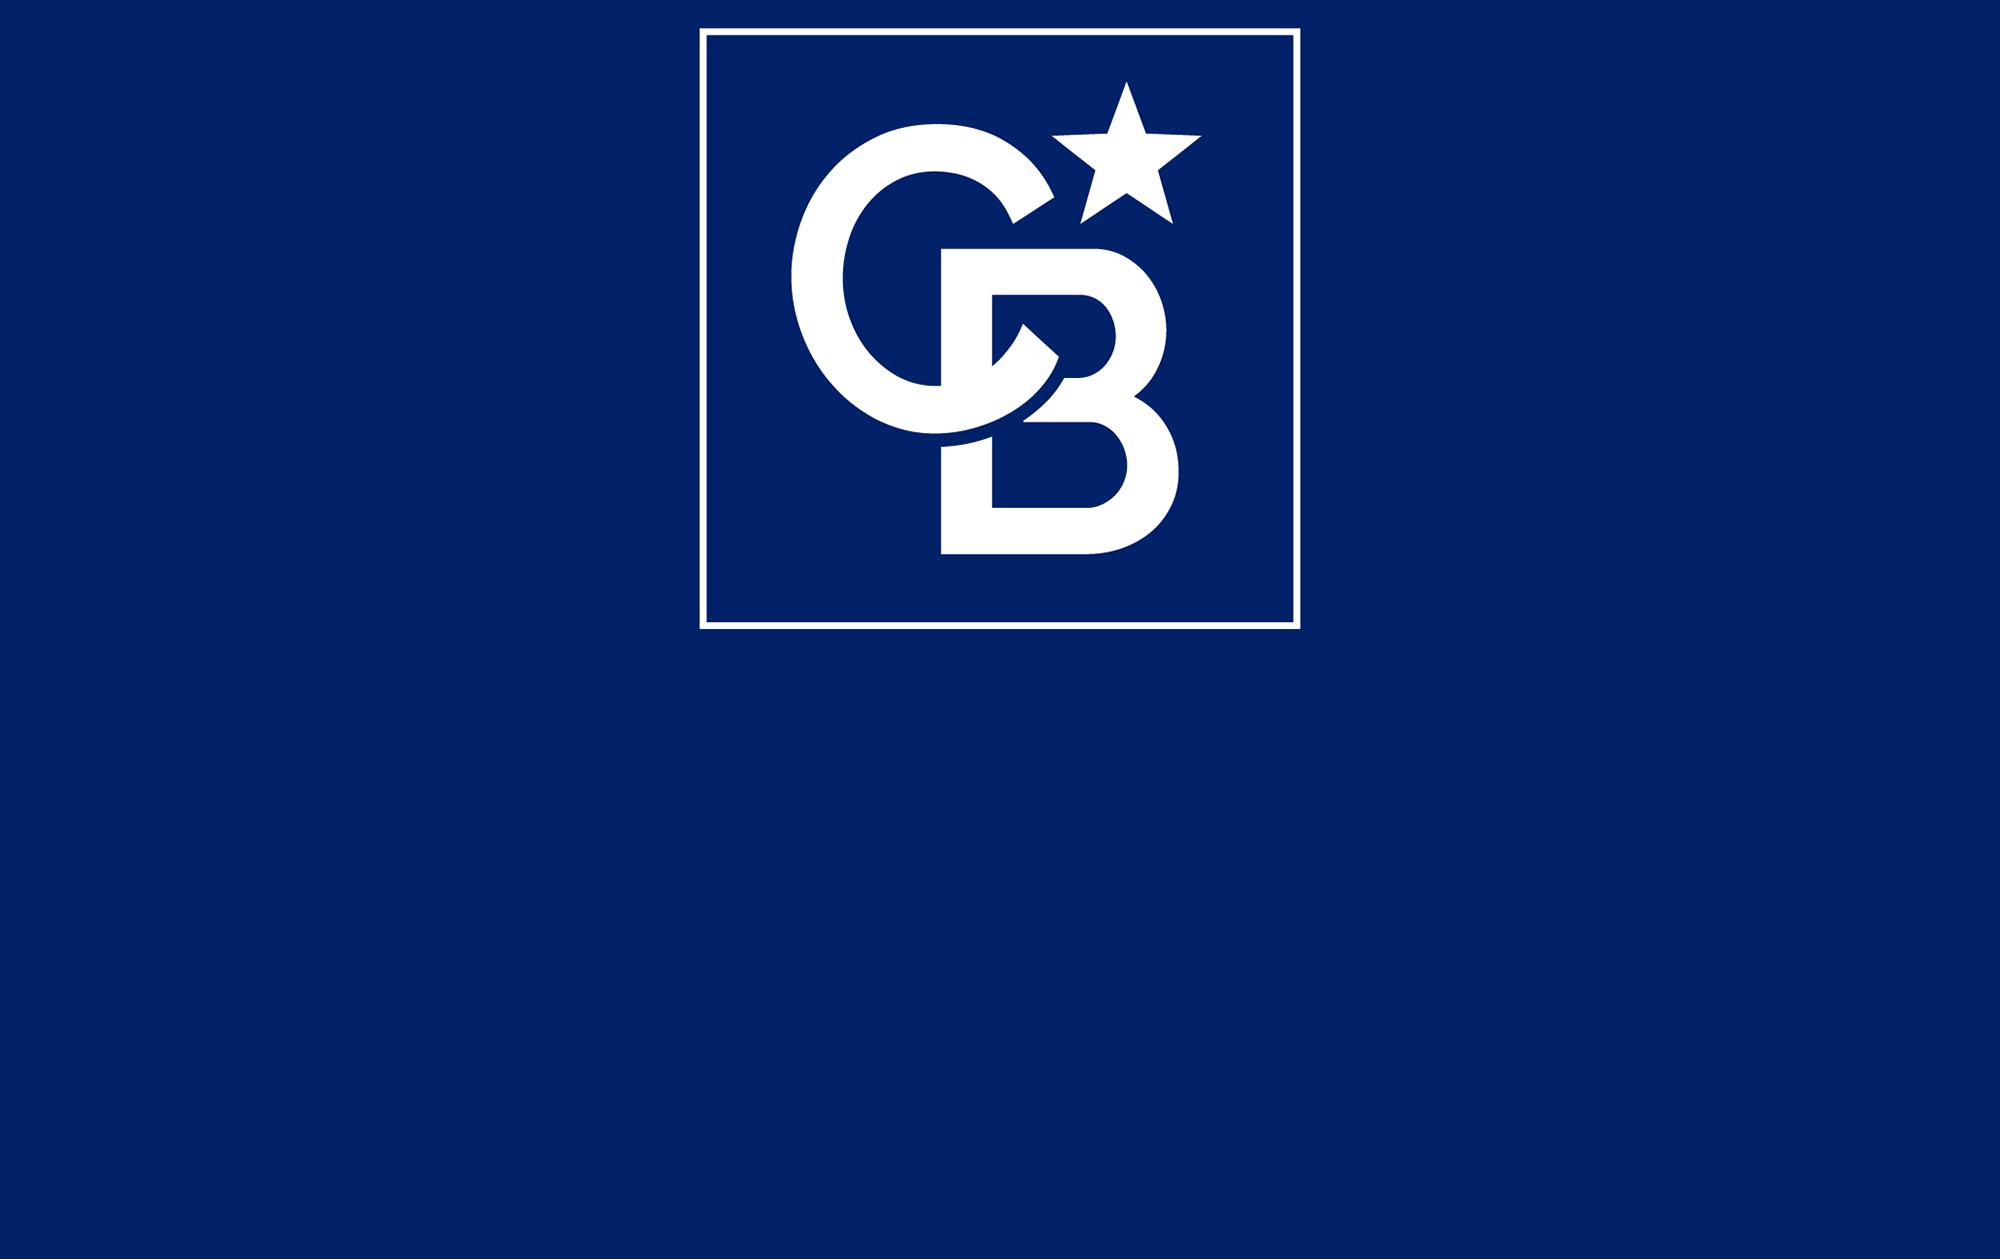 Christen Yoo - Coldwell Banker Hubbell BriarWood Logo